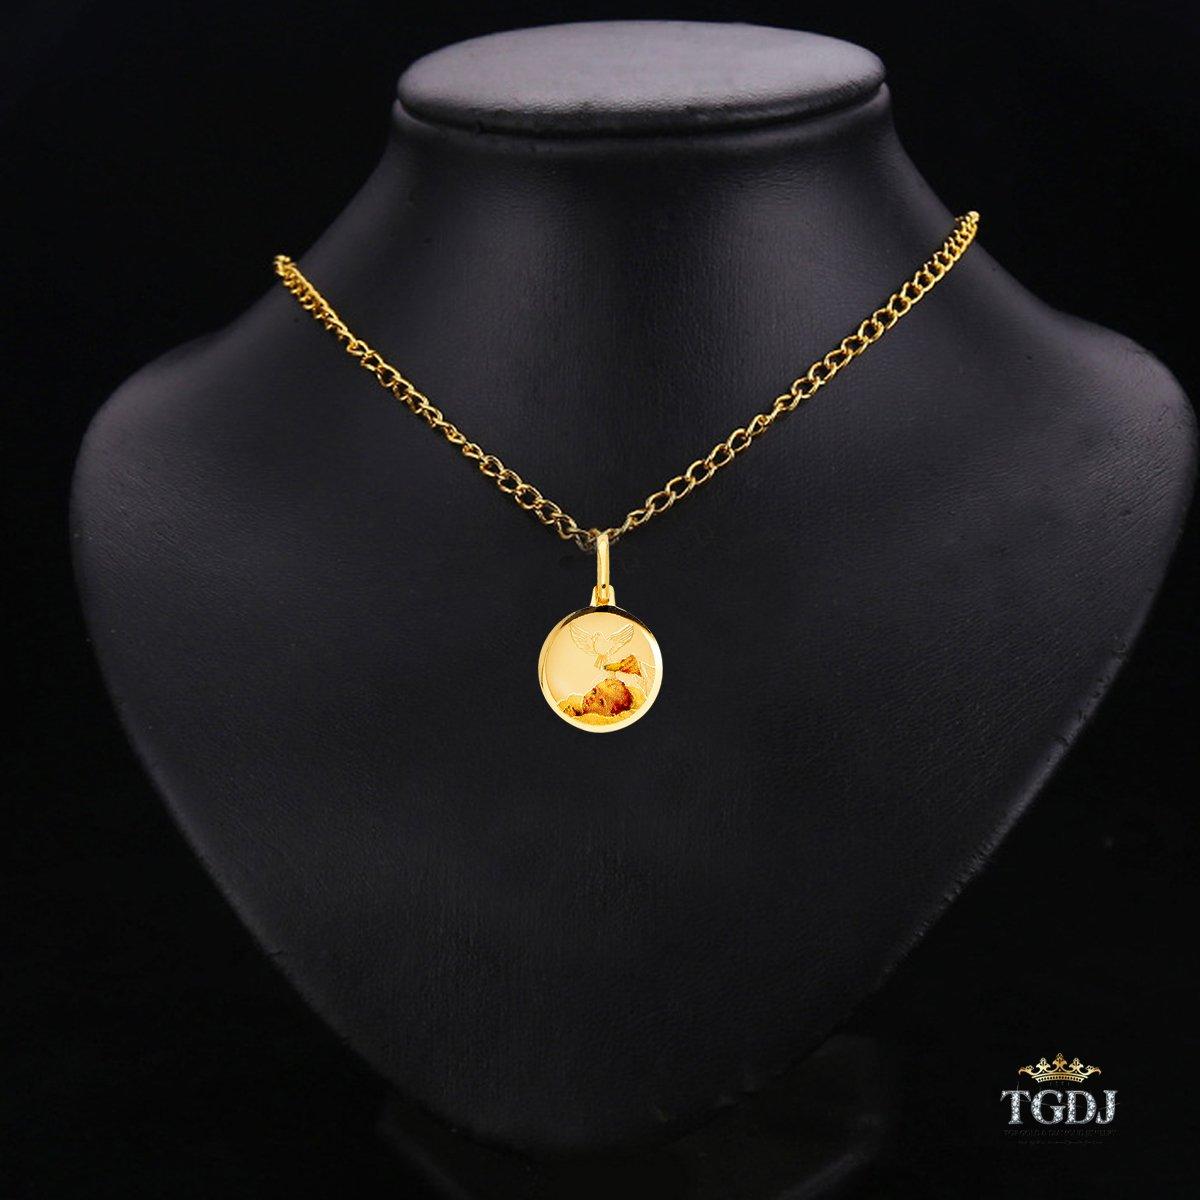 Top Gold /& Diamond Jewelry 14k Yellow White Rose Gold CZ Religious Praying Hands Pendant